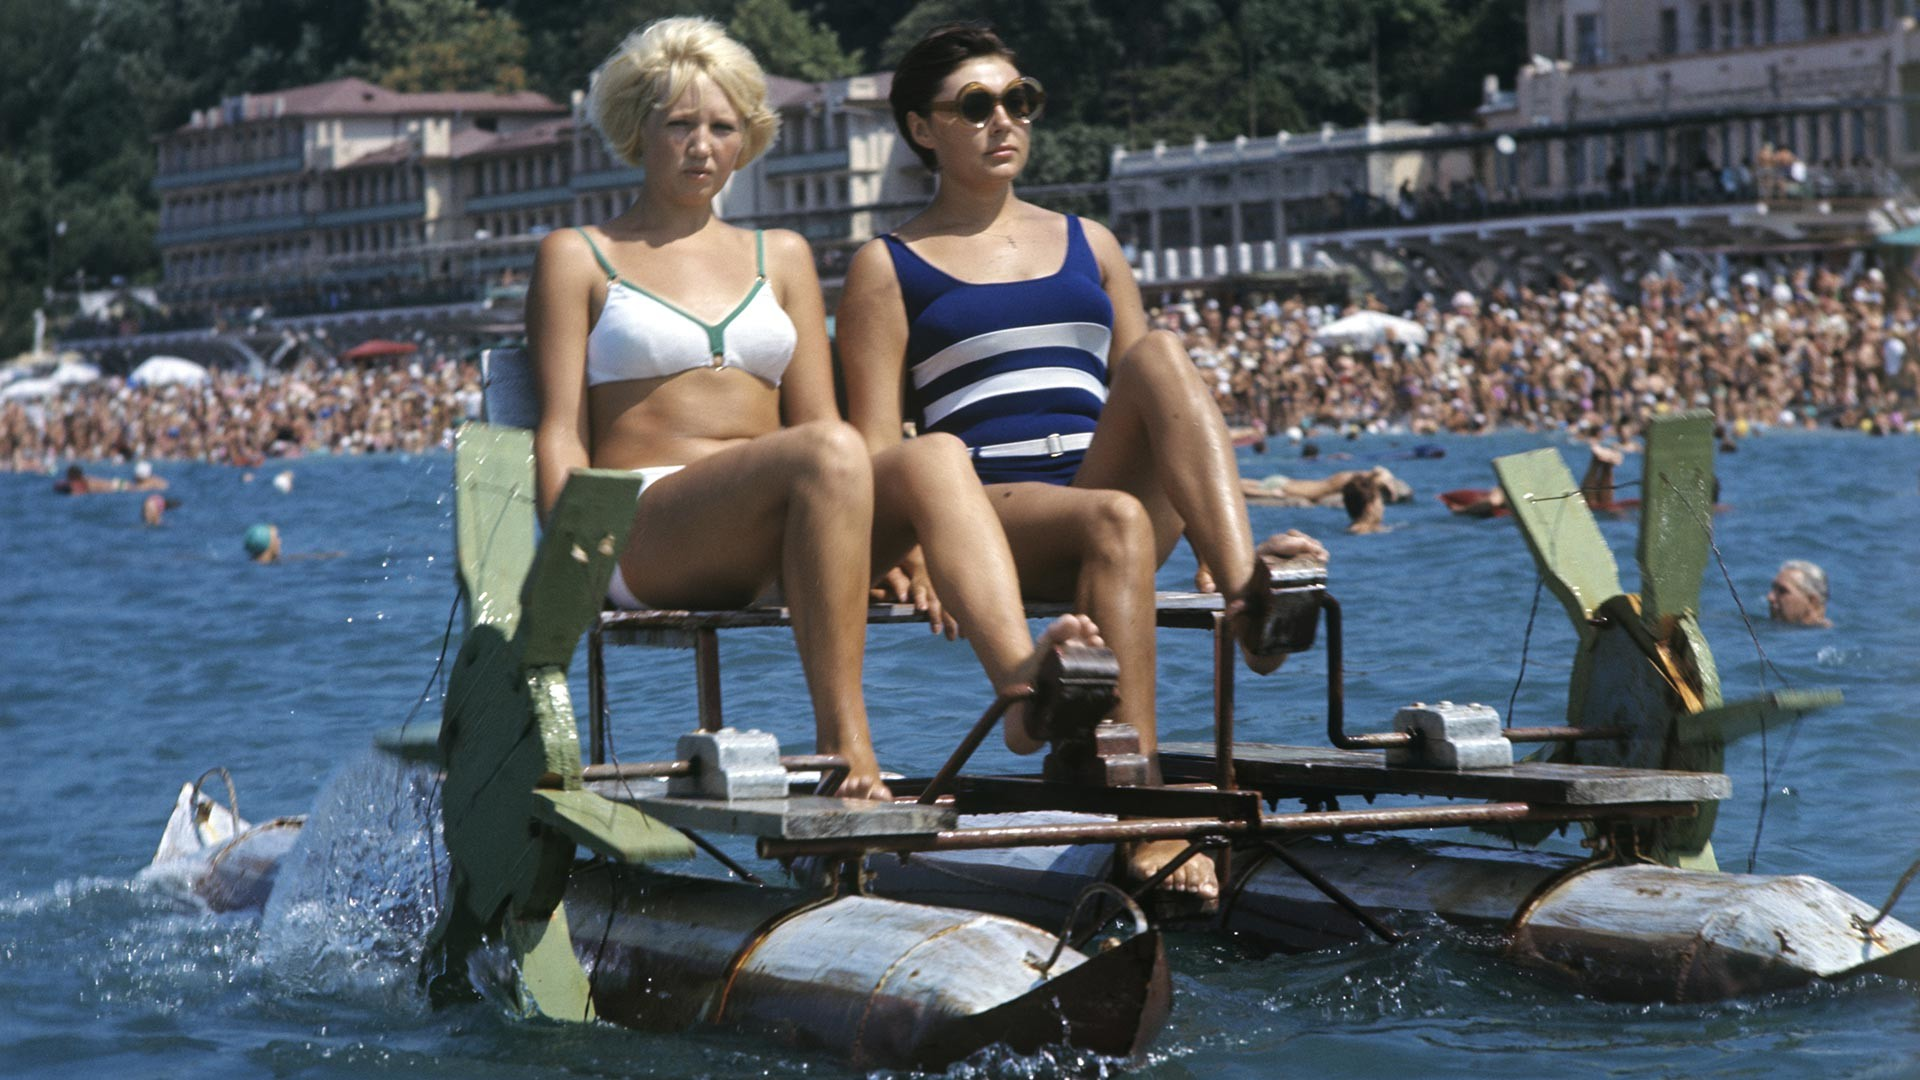 Ženske na katamaranu, Soči, Črno morje